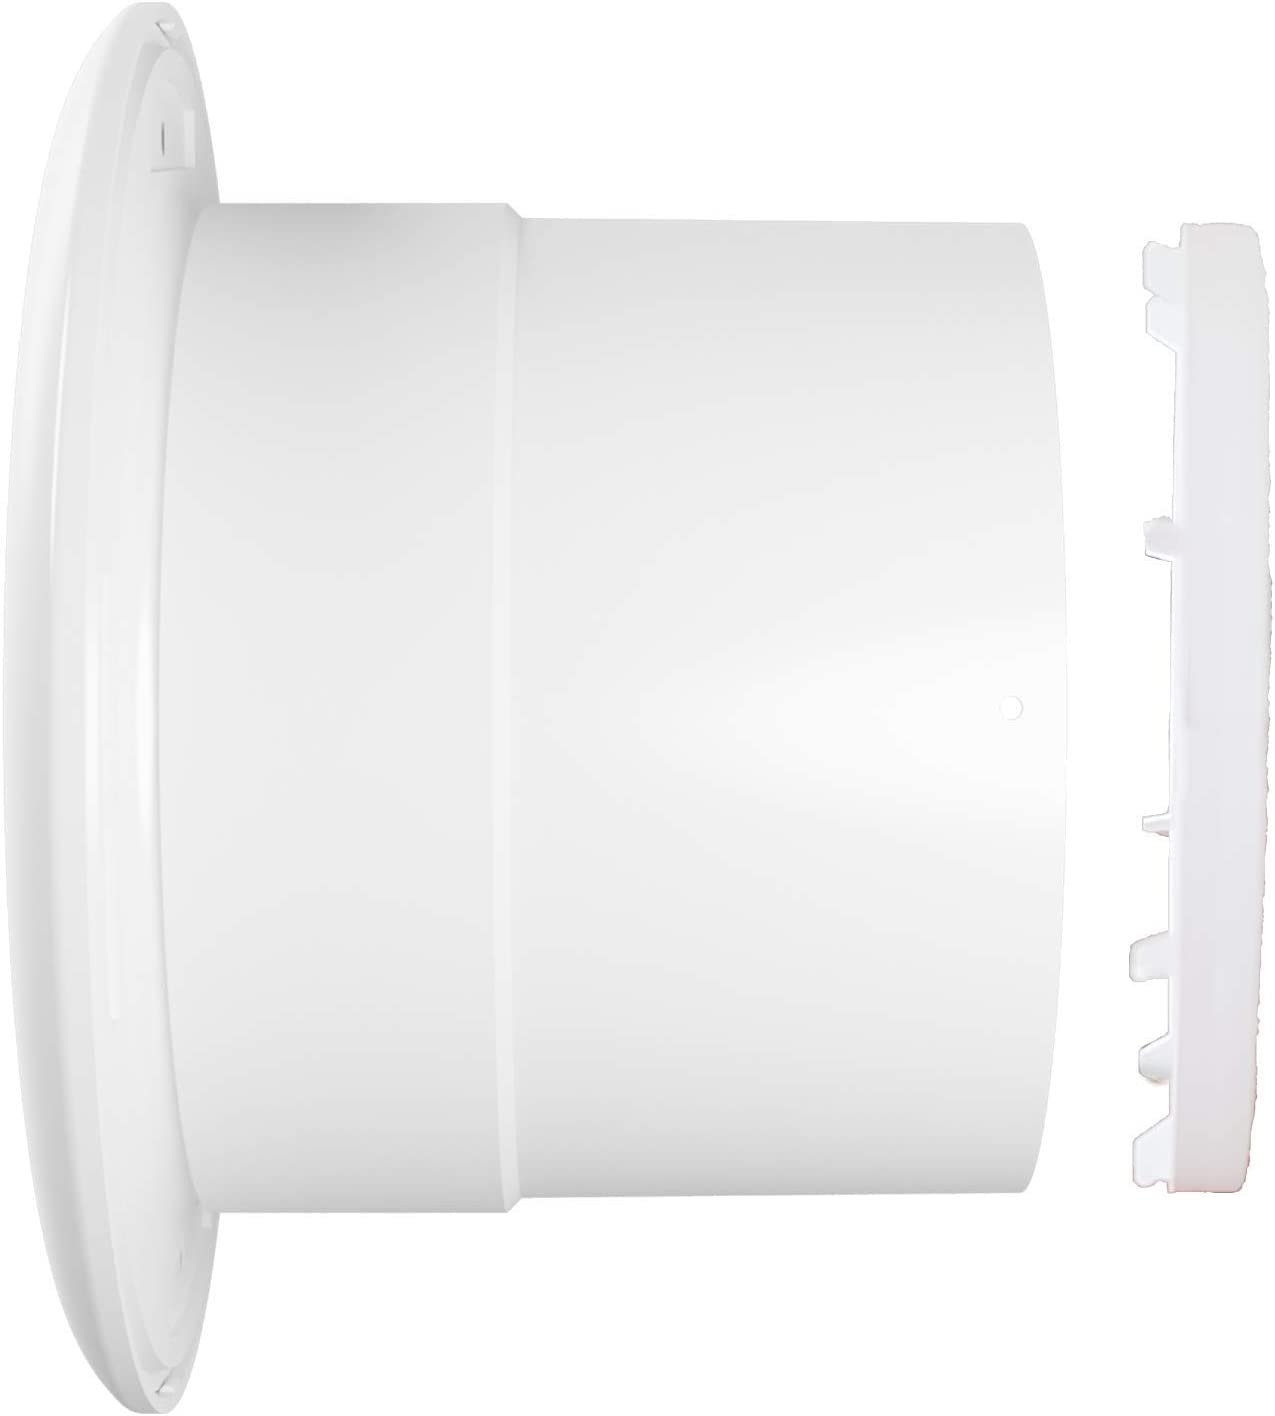 Ventilador extractor de ba/ño aire 125 mm Silencioso con v/álvula Anti-retorno+mosquitera integrada,190 m3 h.Ideal para ba/ño,cocina,inodoro,oficina,silencioso,alta calidad,Garant/ía 5 A/ÑOS